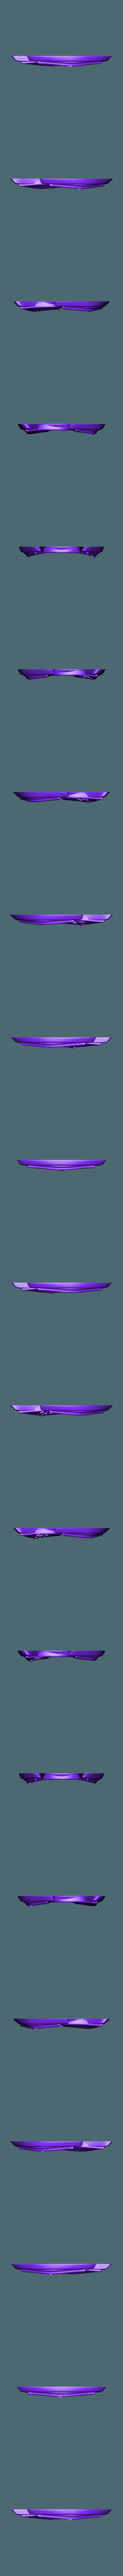 dreadnought11mm-body2.stl Download free STL file Dreadnought Fidget Spinner • 3D print object, ProteanMan